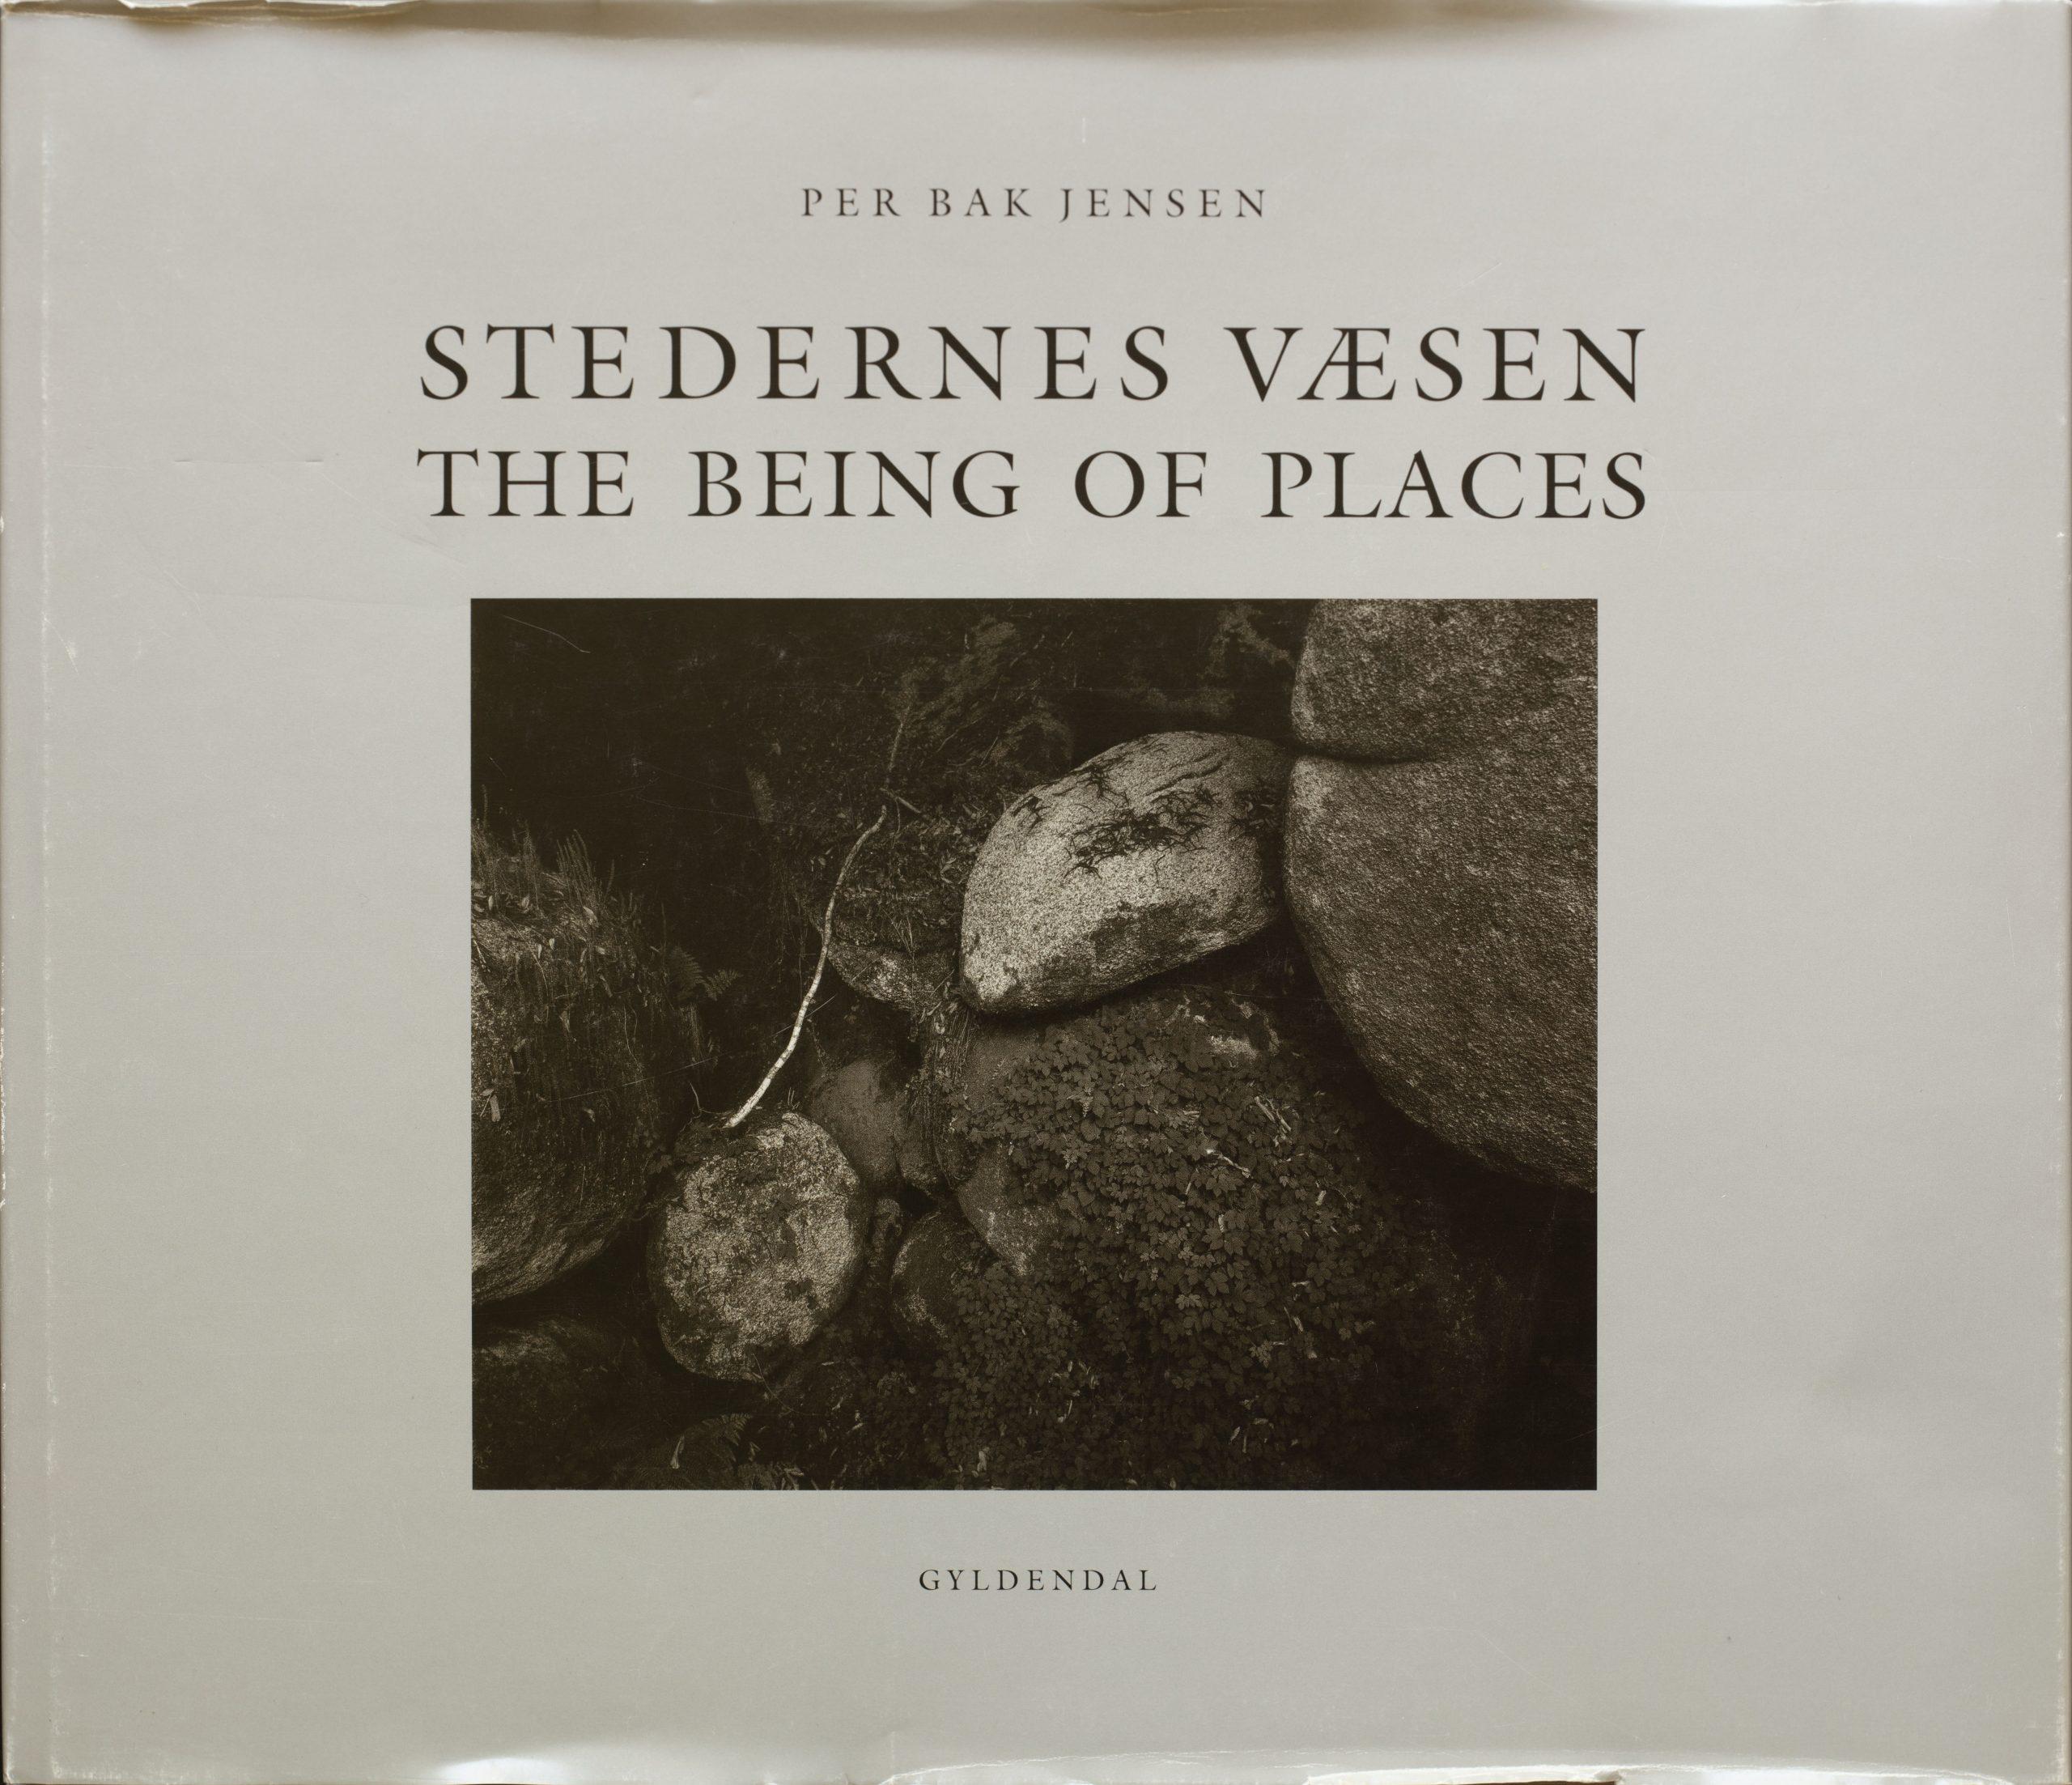 Exhibition Preview: Per Bak Jensen. Books and Catalogs